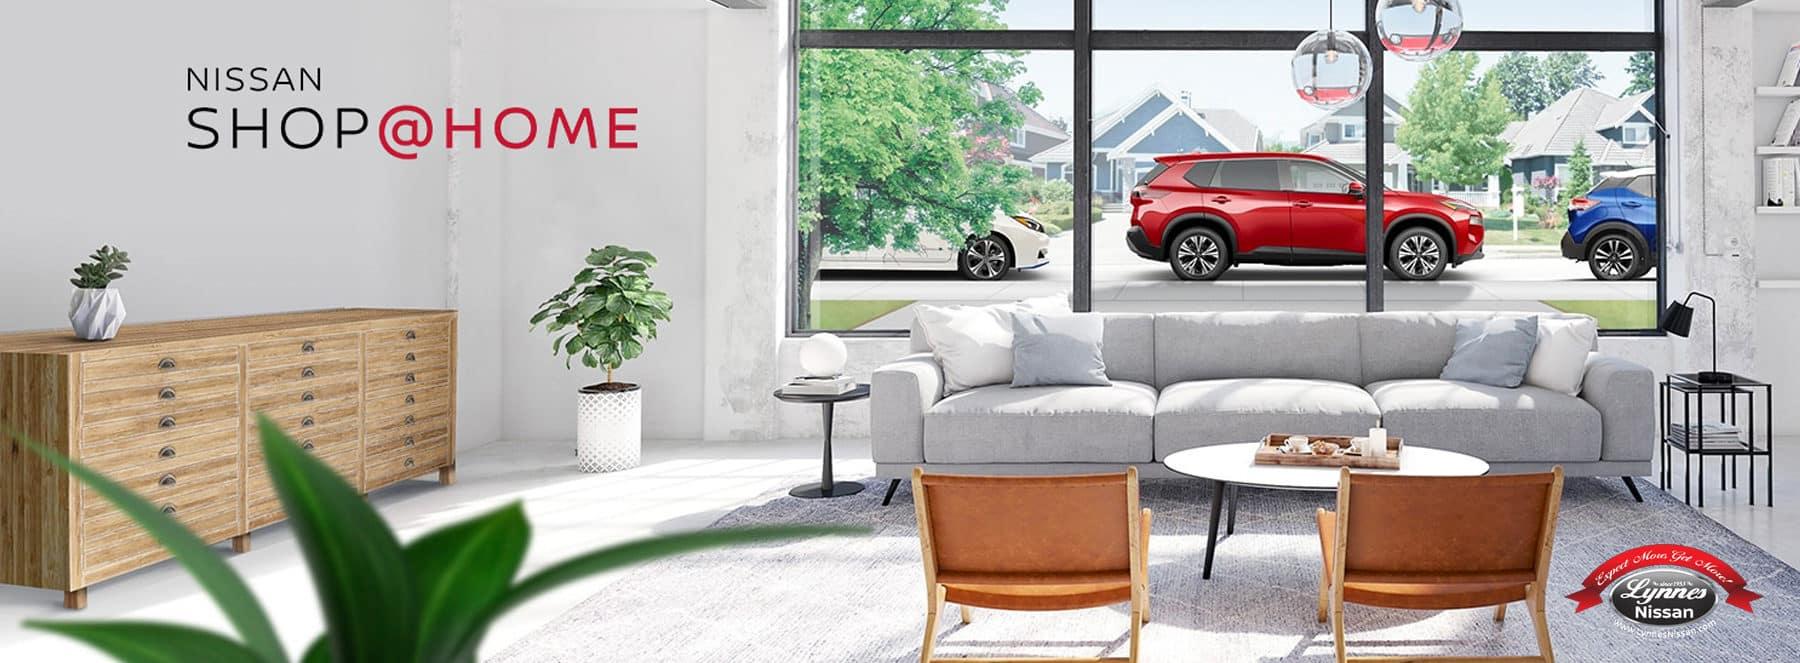 Shop At Home Nissan